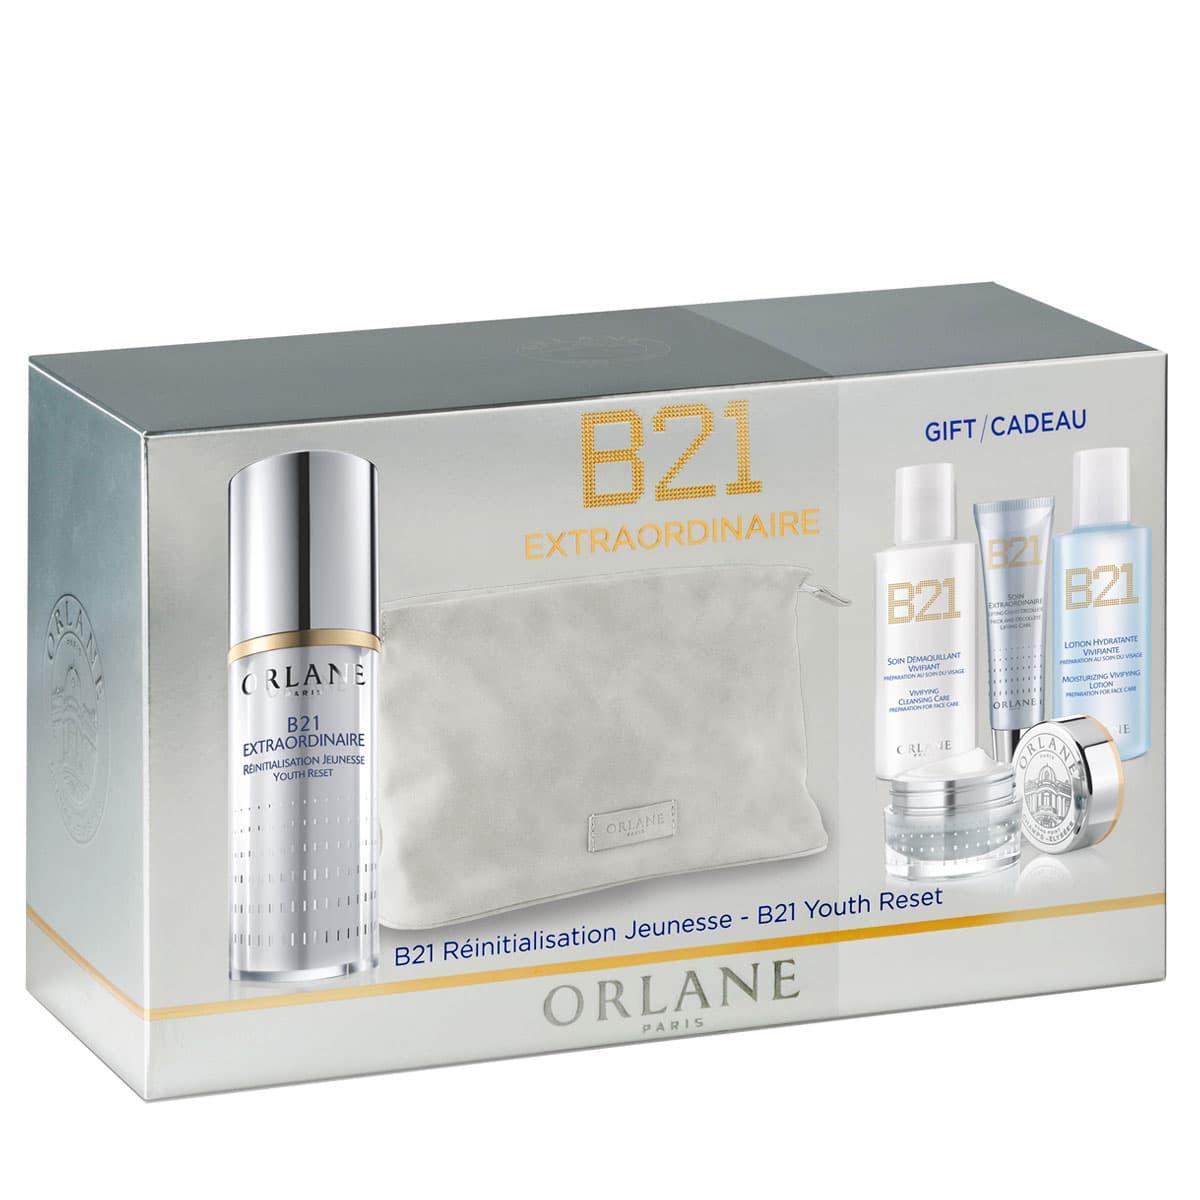 Coffret B21 Extraordinaire - ORLANE